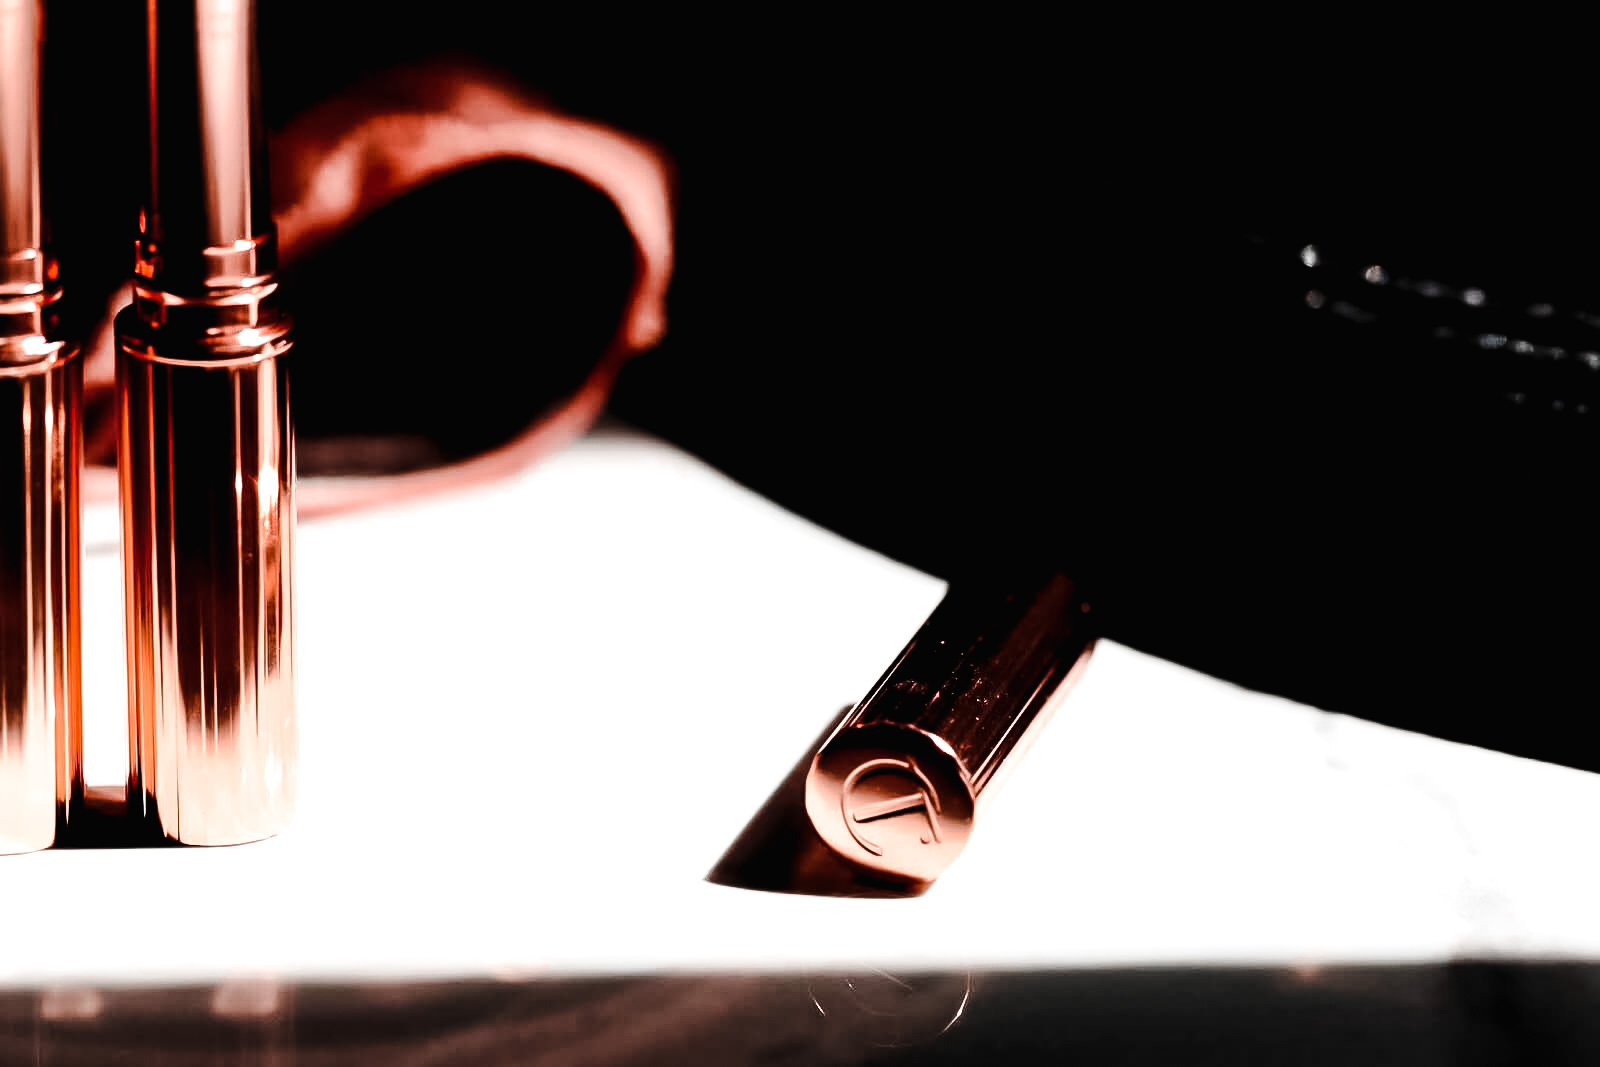 Charlotte Tilbury Superstar Lips rouge a lèvres gloss avis